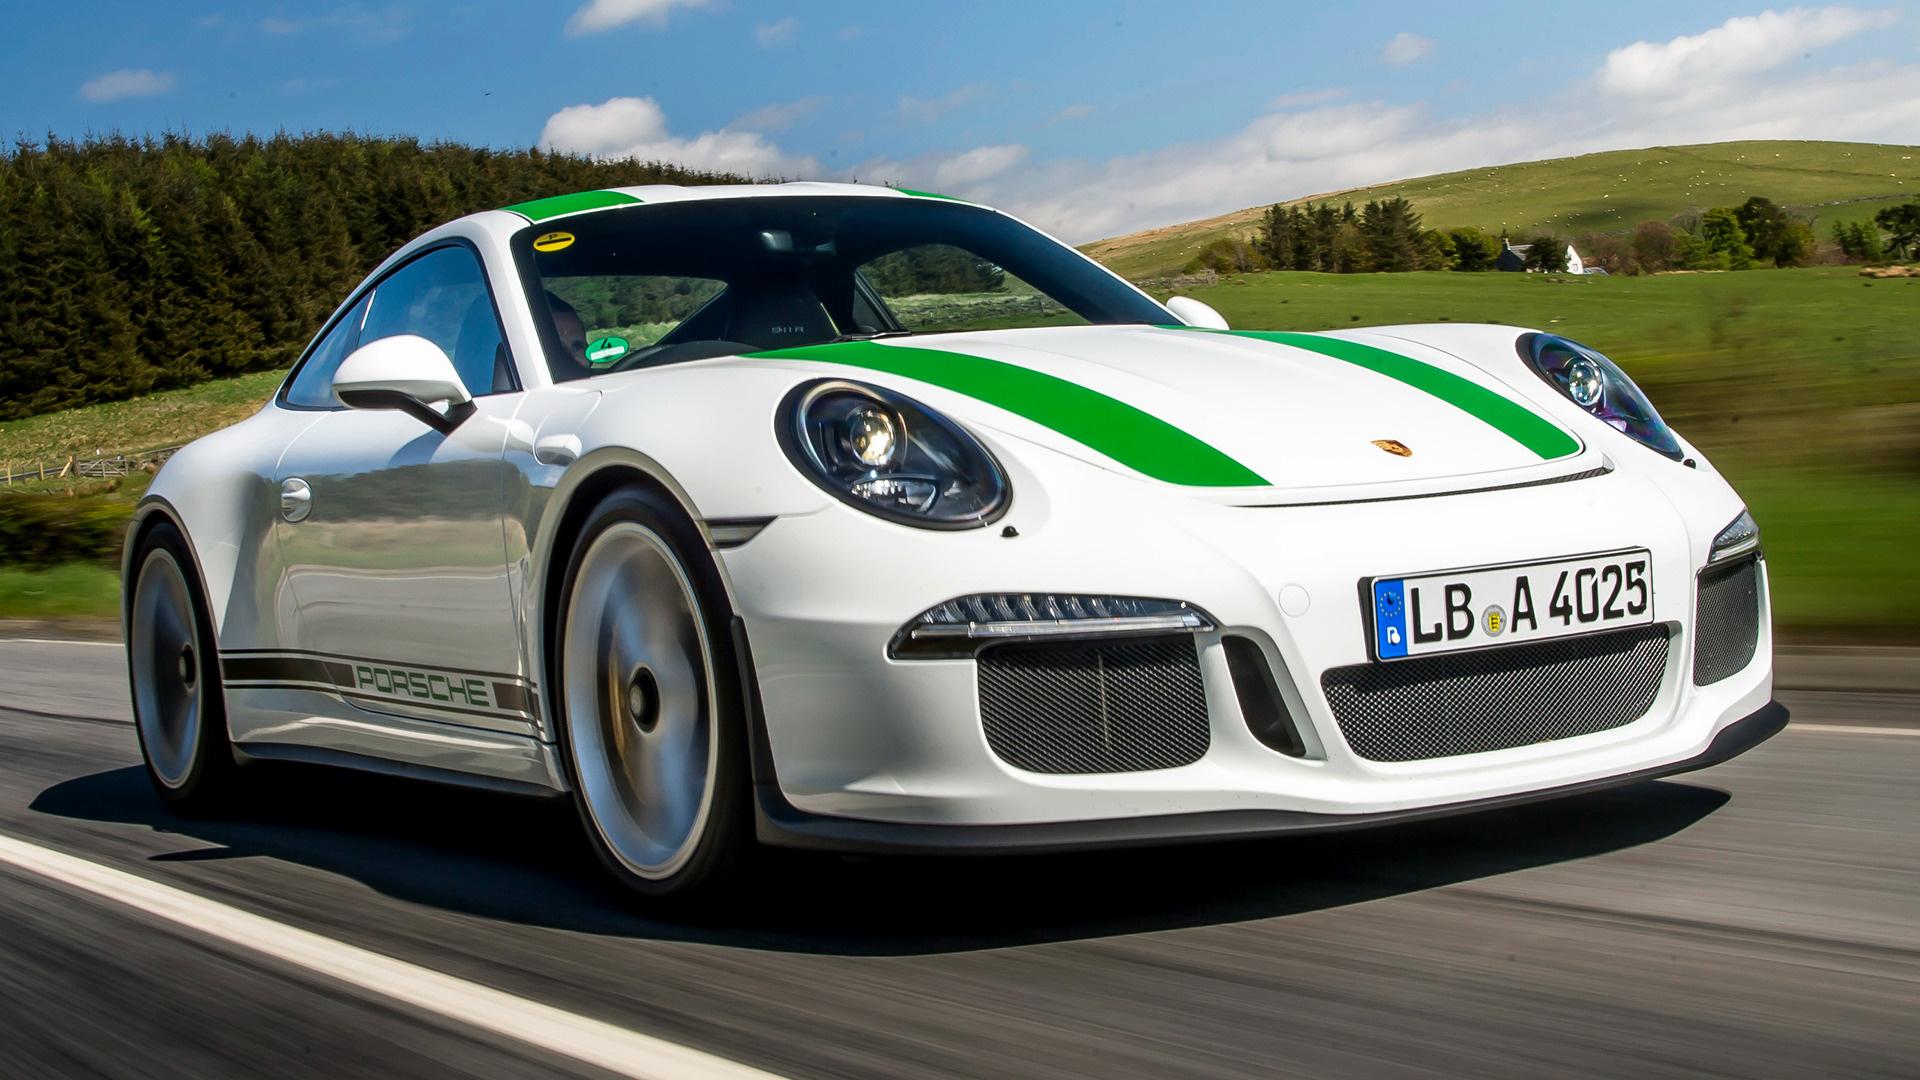 911 Carrera Gts >> 2016 Porsche 911 R (UK) - Wallpapers and HD Images | Car Pixel